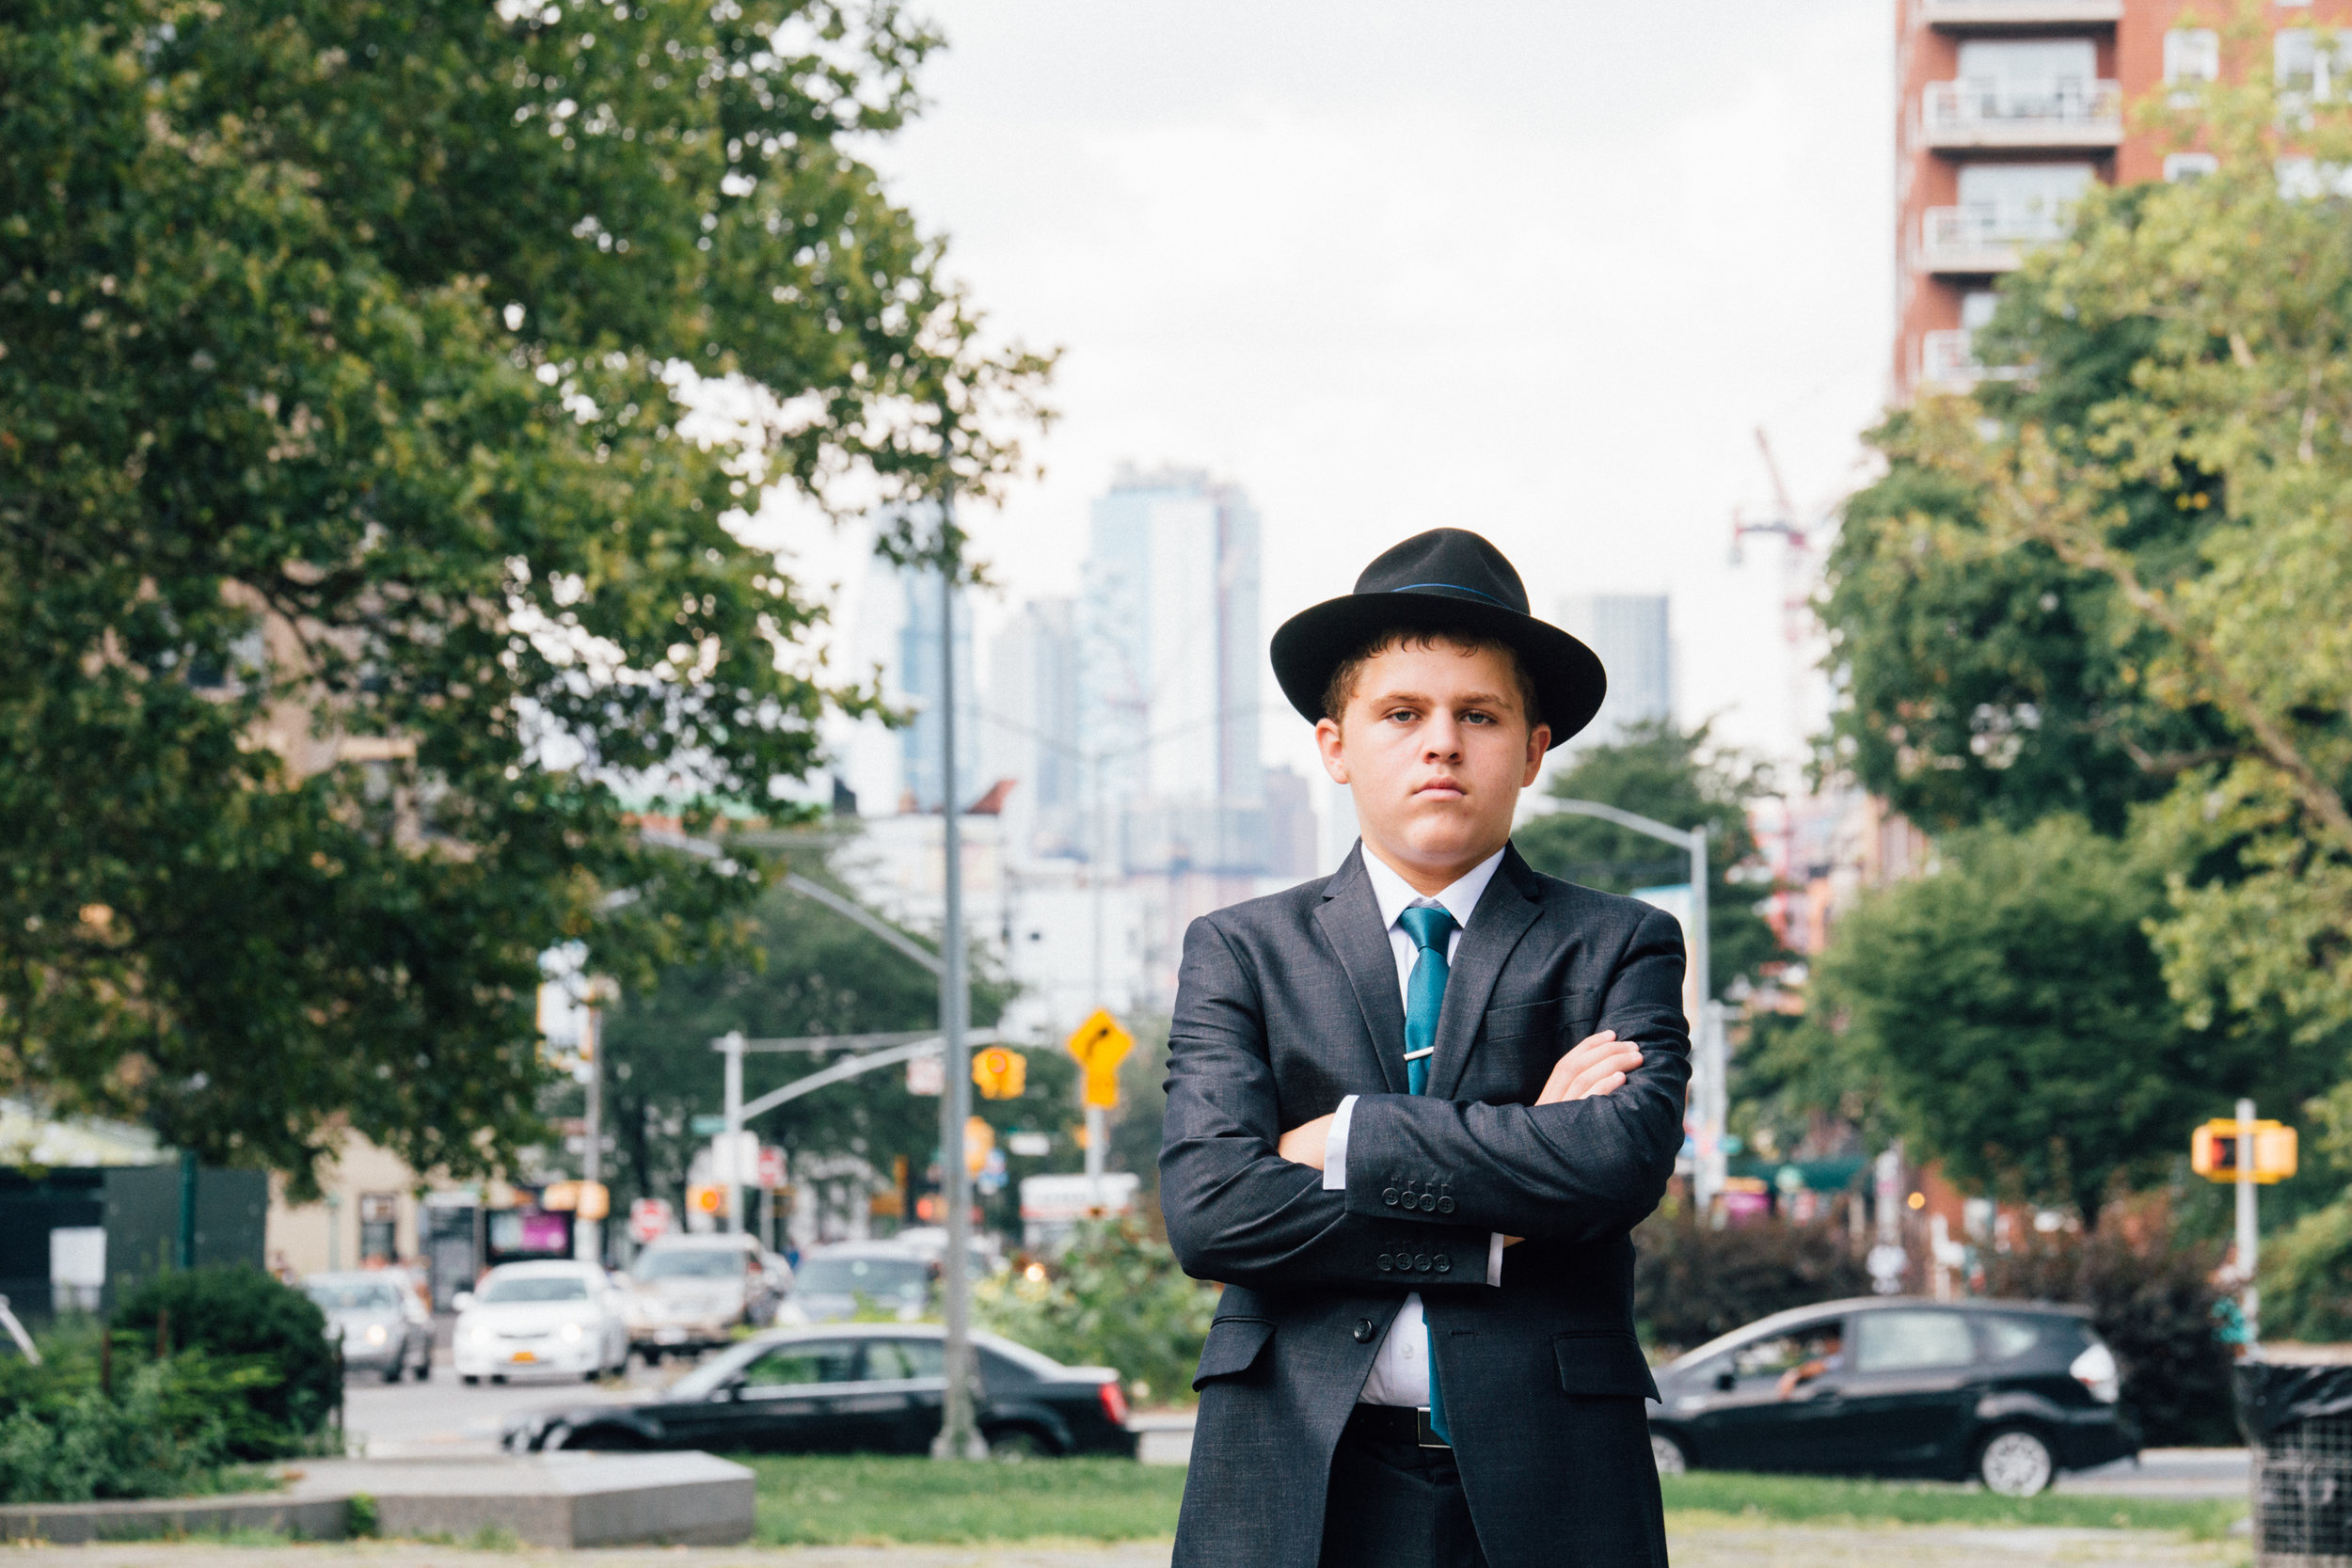 Bar Mitzvah Meir Sandman - photography, new york, events, people -0016.jpg